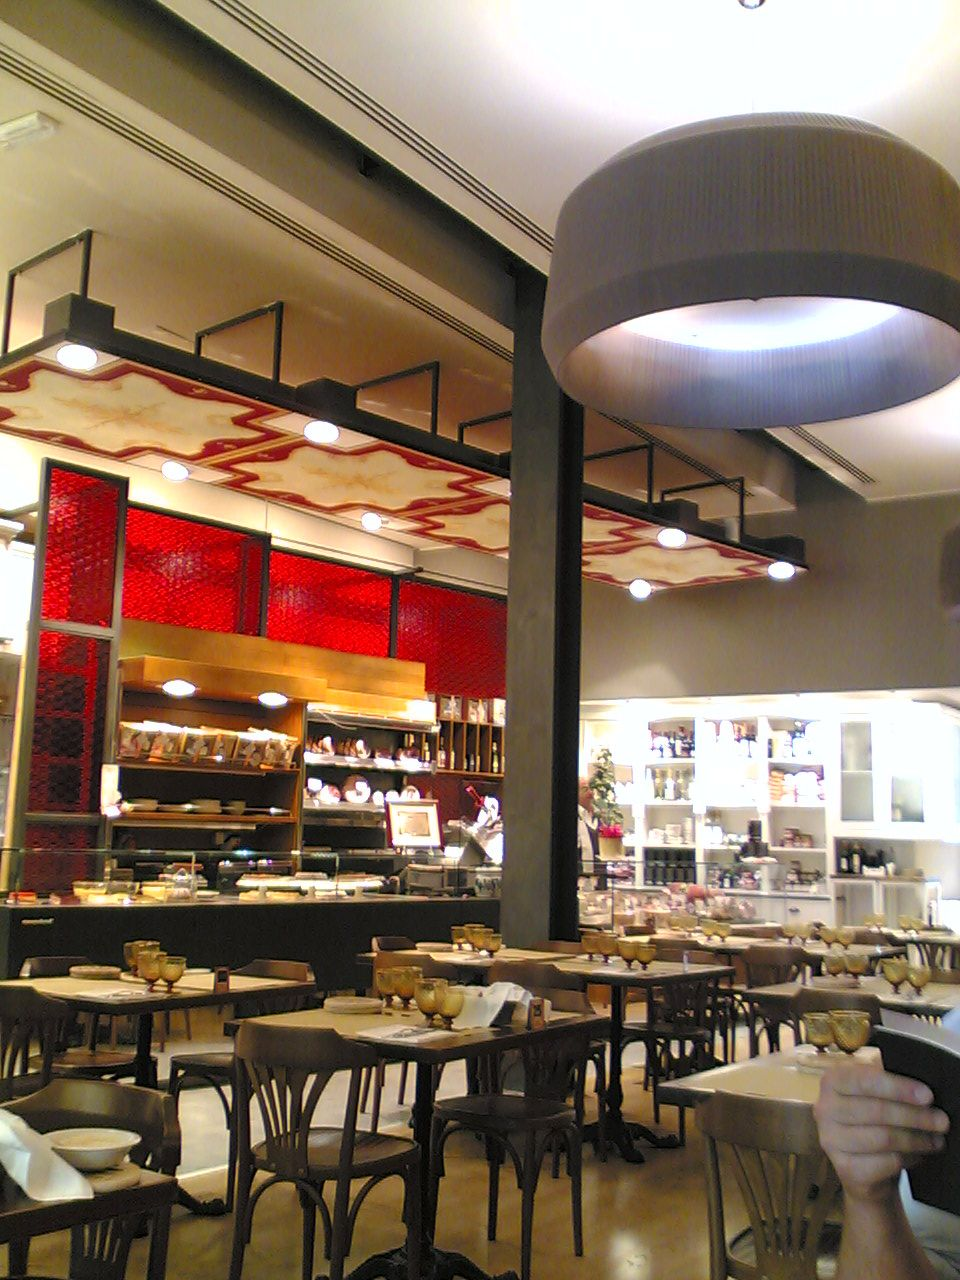 Cusina E Botega  Ferrara  Kitchen Designs  Pinterest  Coffee Delectable Coffee Shop Kitchen Design Inspiration Design